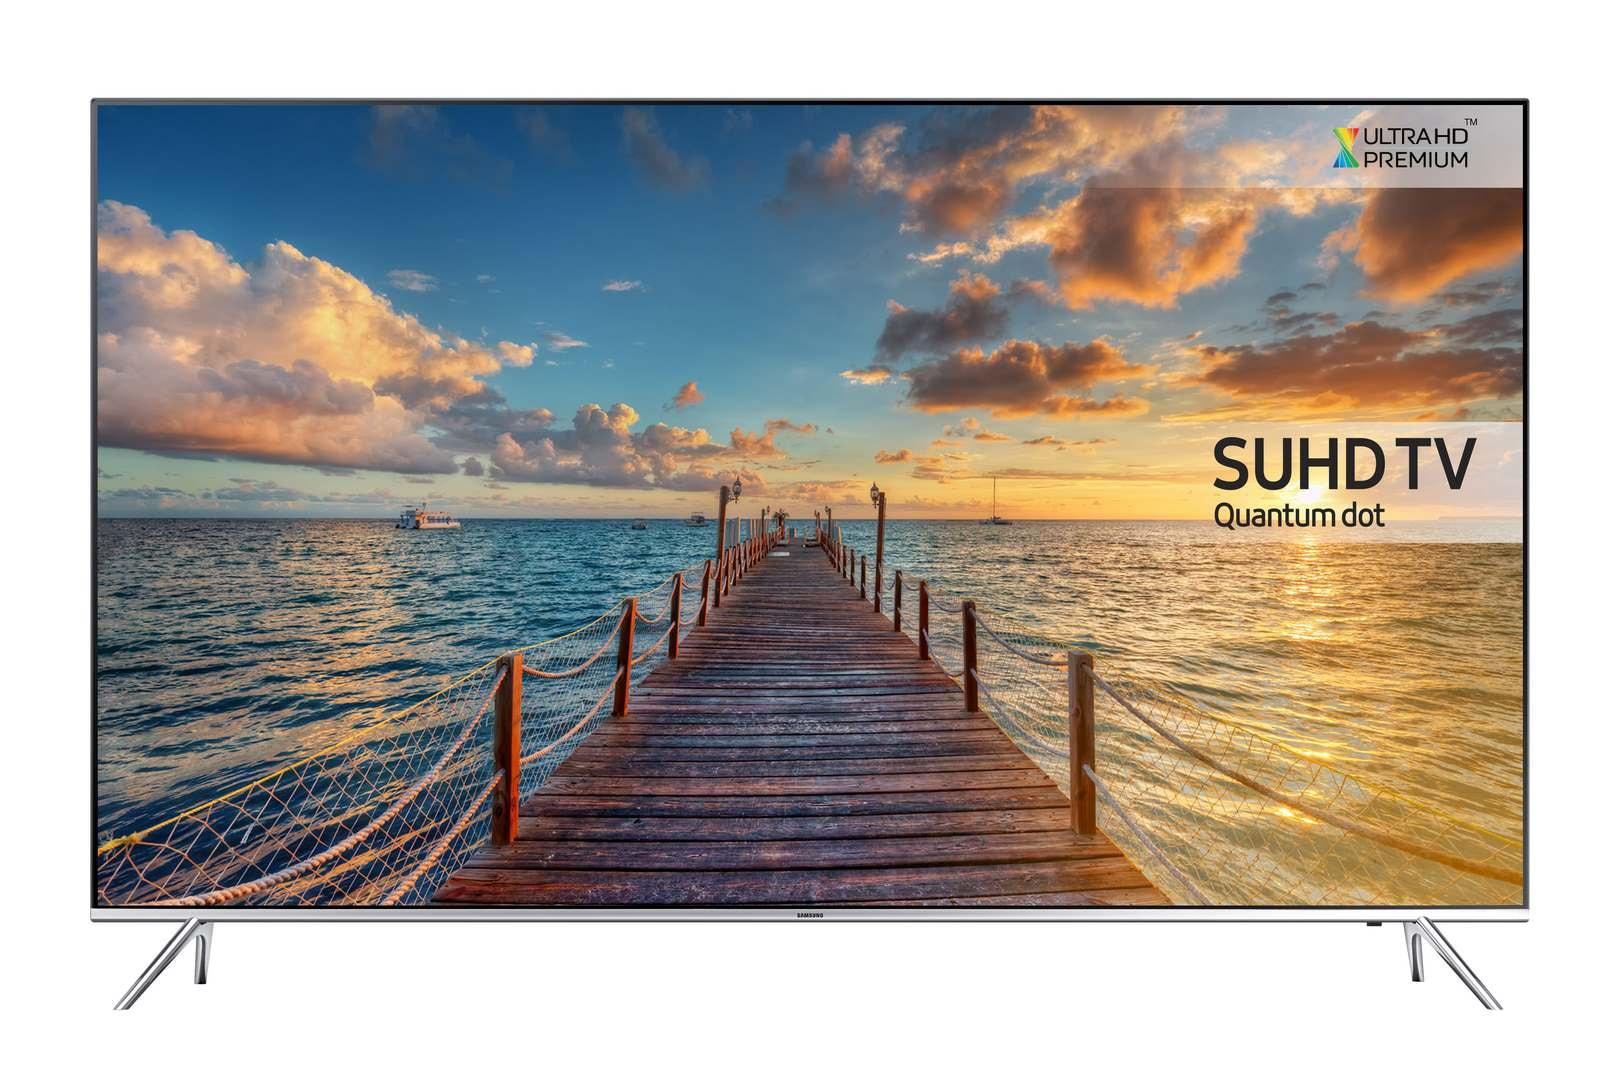 7-Series Quantum Dot SUHD TV UE65KS7000